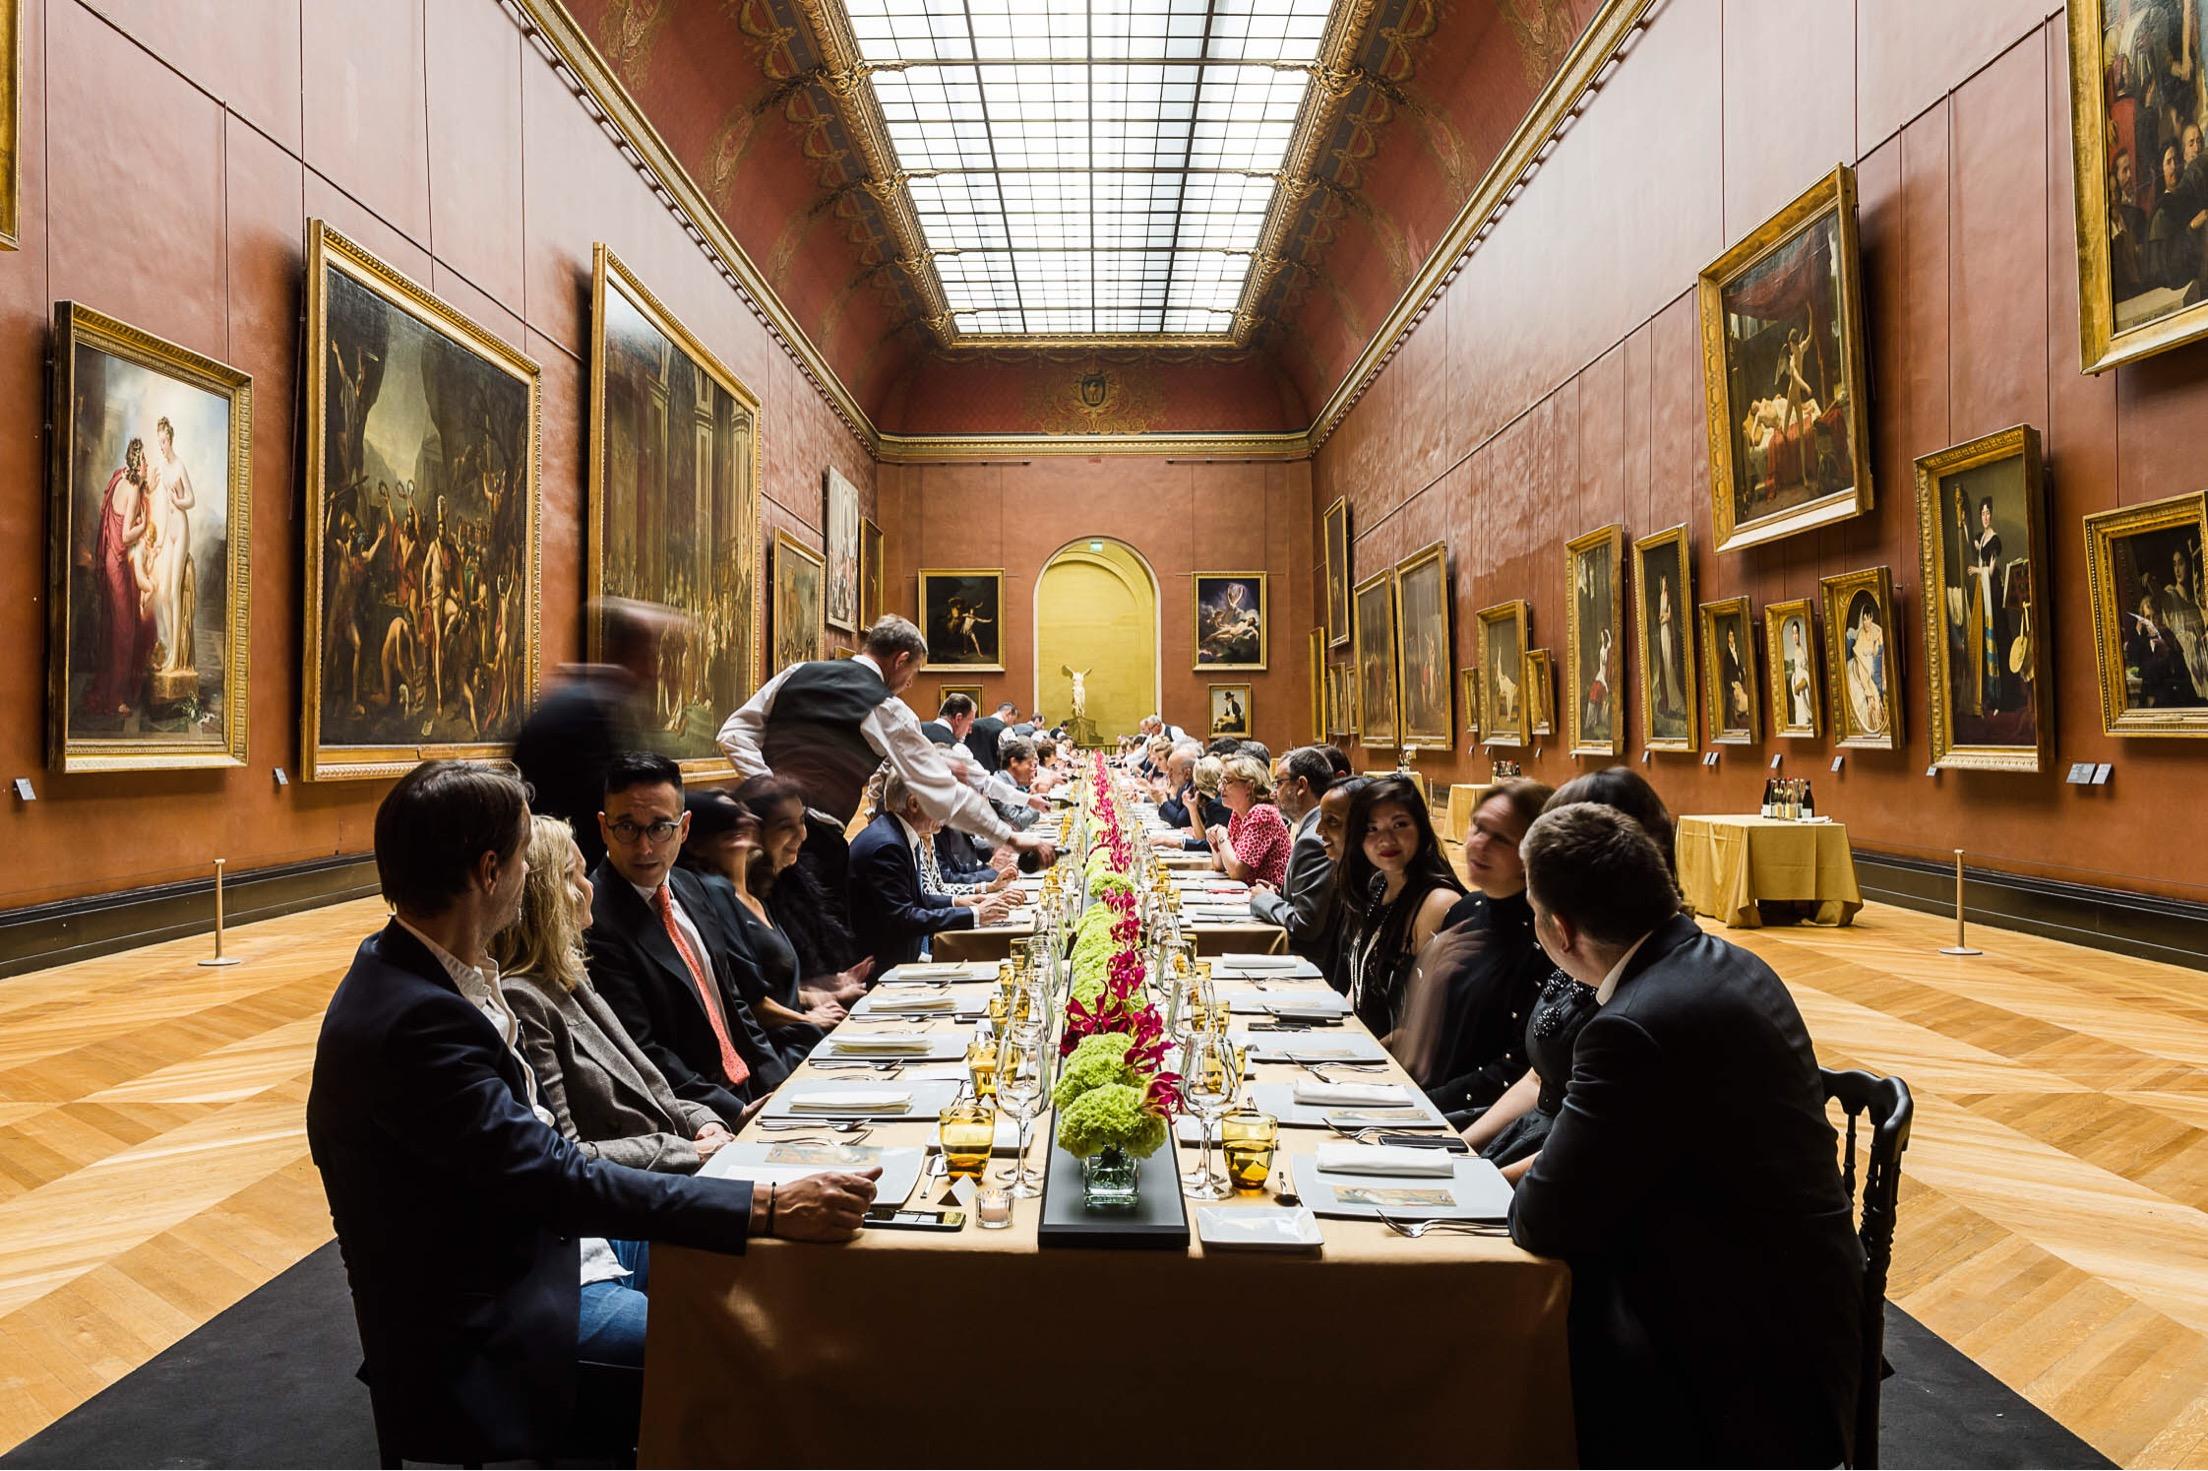 Photo Courtesy: Louvre